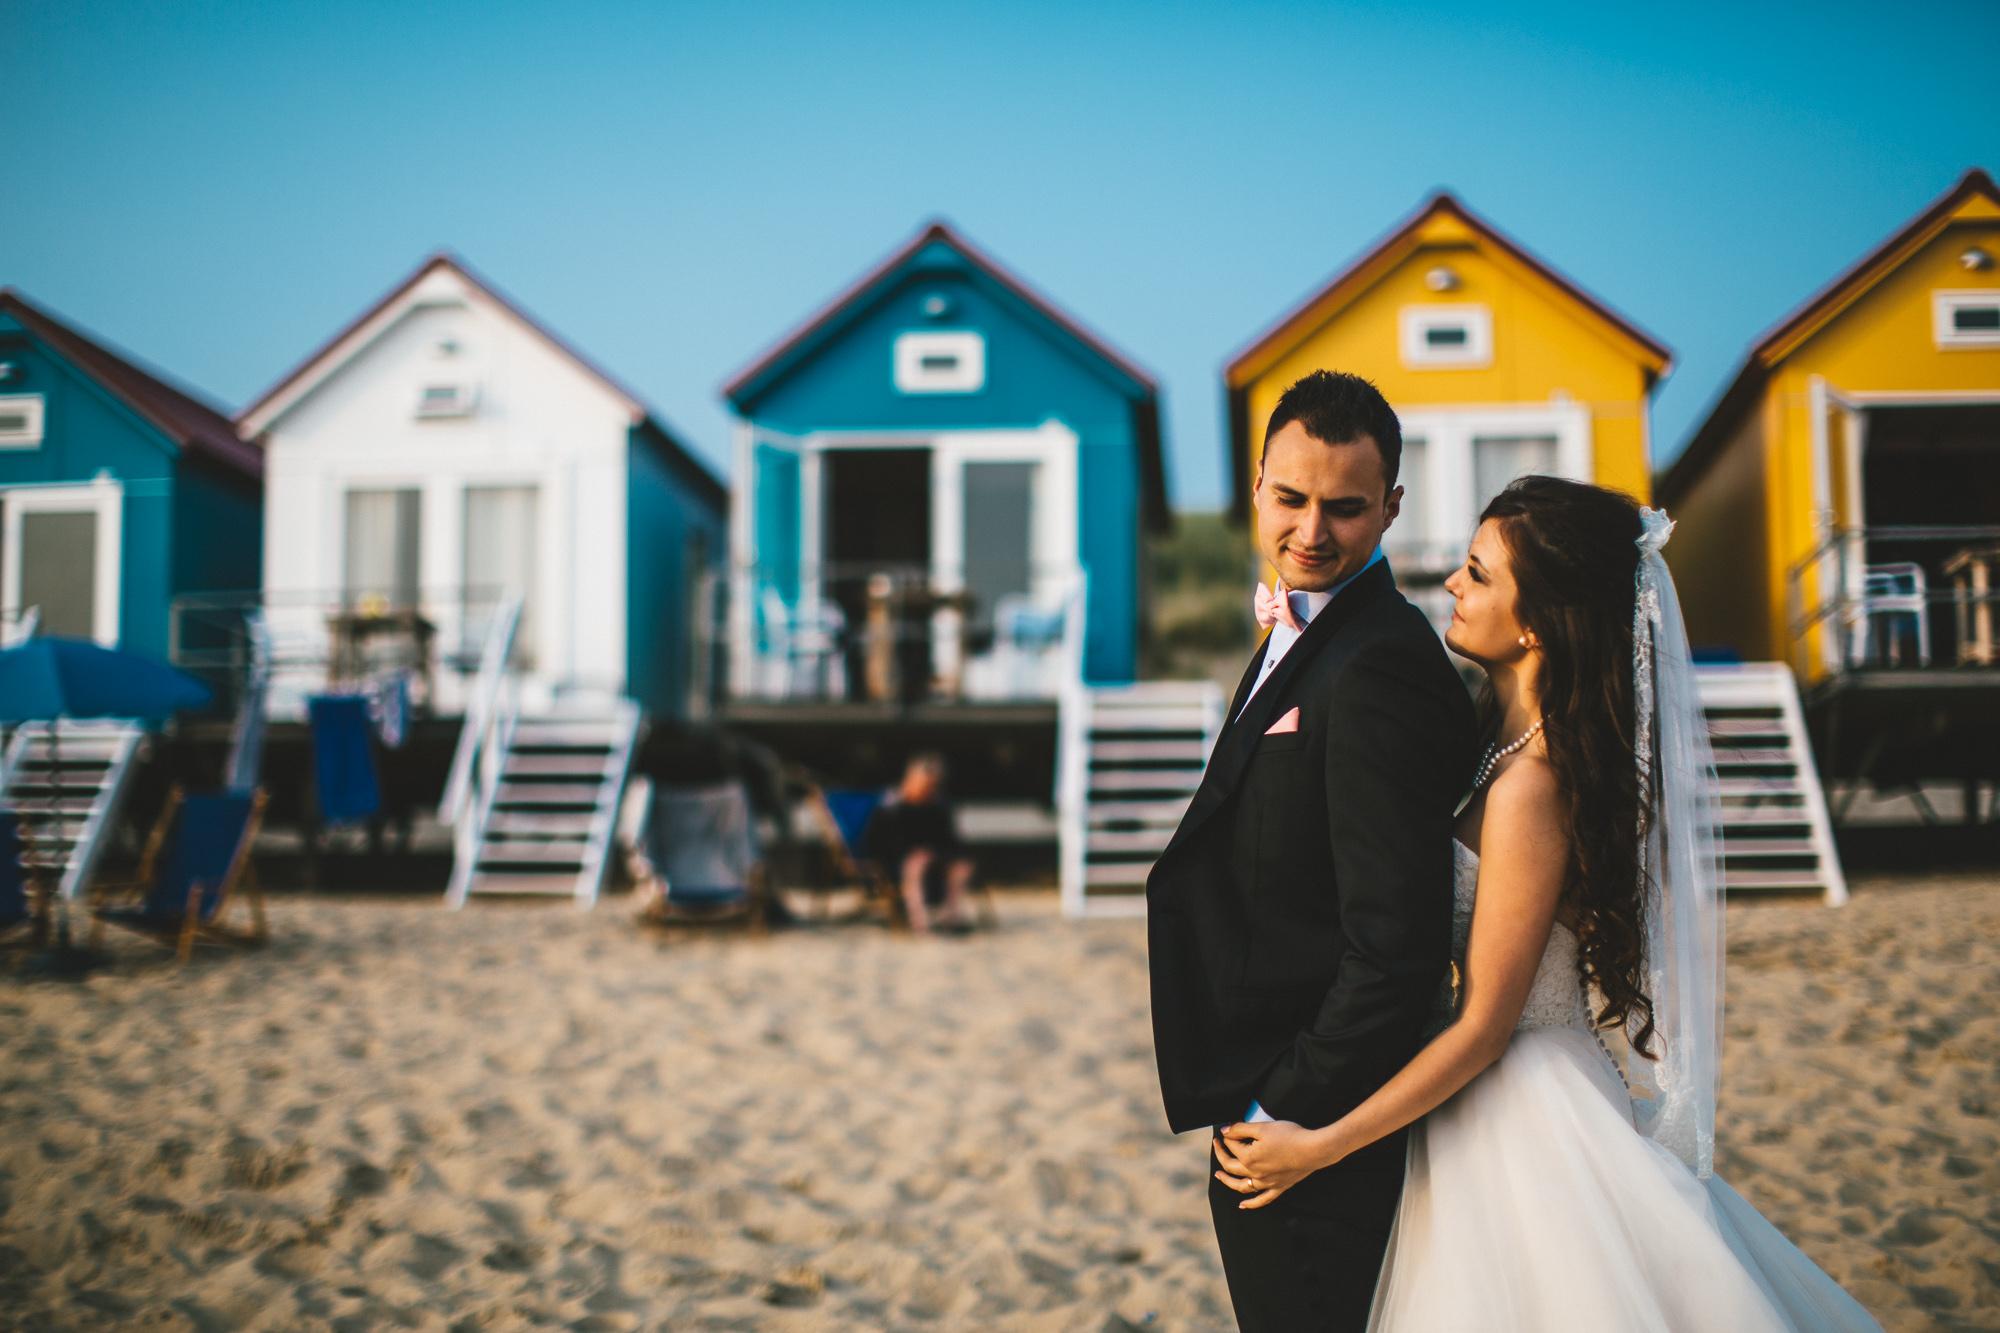 after wedding ia 065 - Afterwedding in Zeeland / Holland